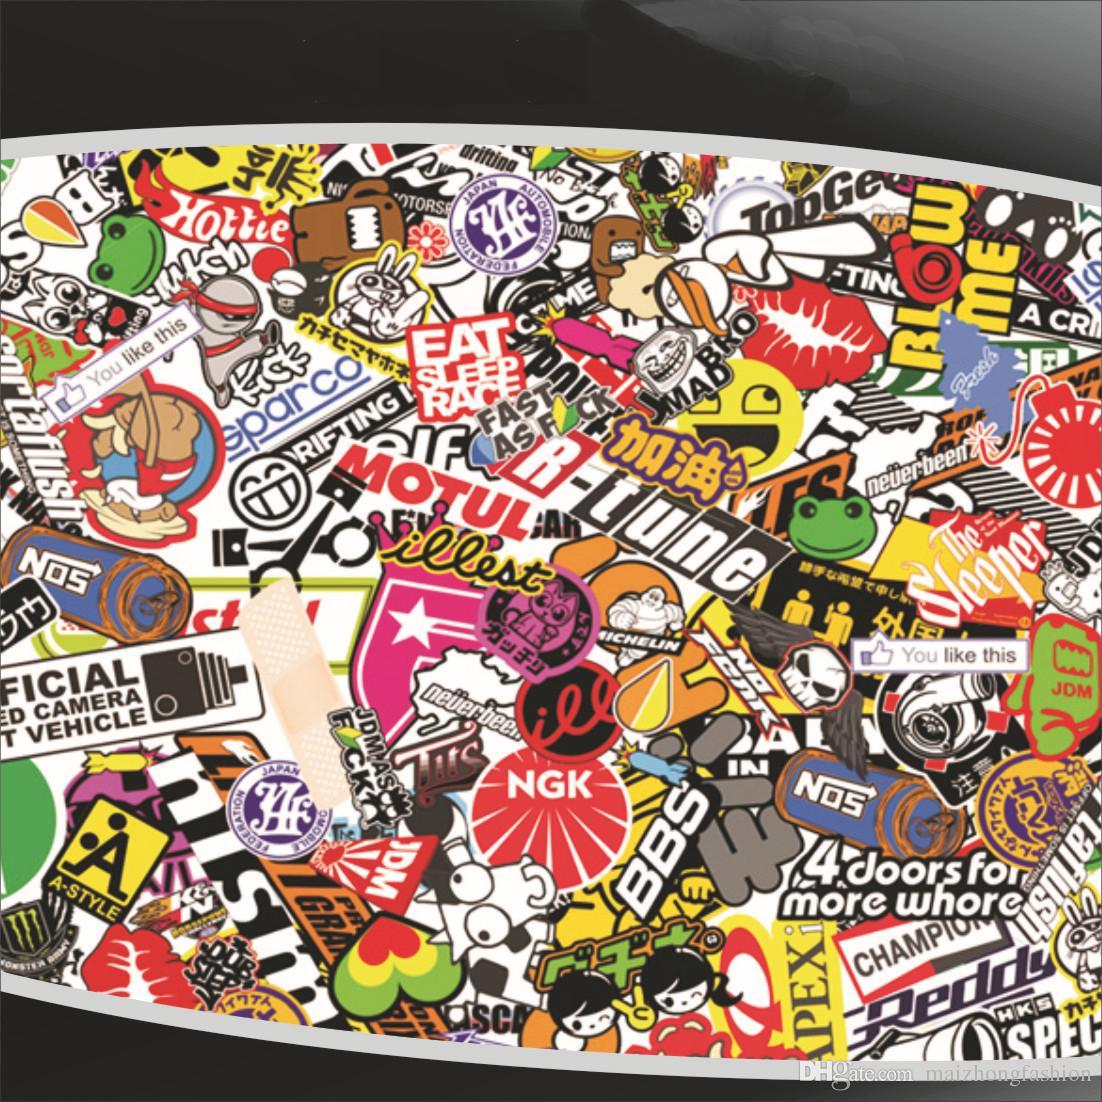 2018 Automobile Graffiti Front Cover Print Car Sticker Character Body Stick A Sticker Label 2017 Hot Sticker Bomb Wholesale